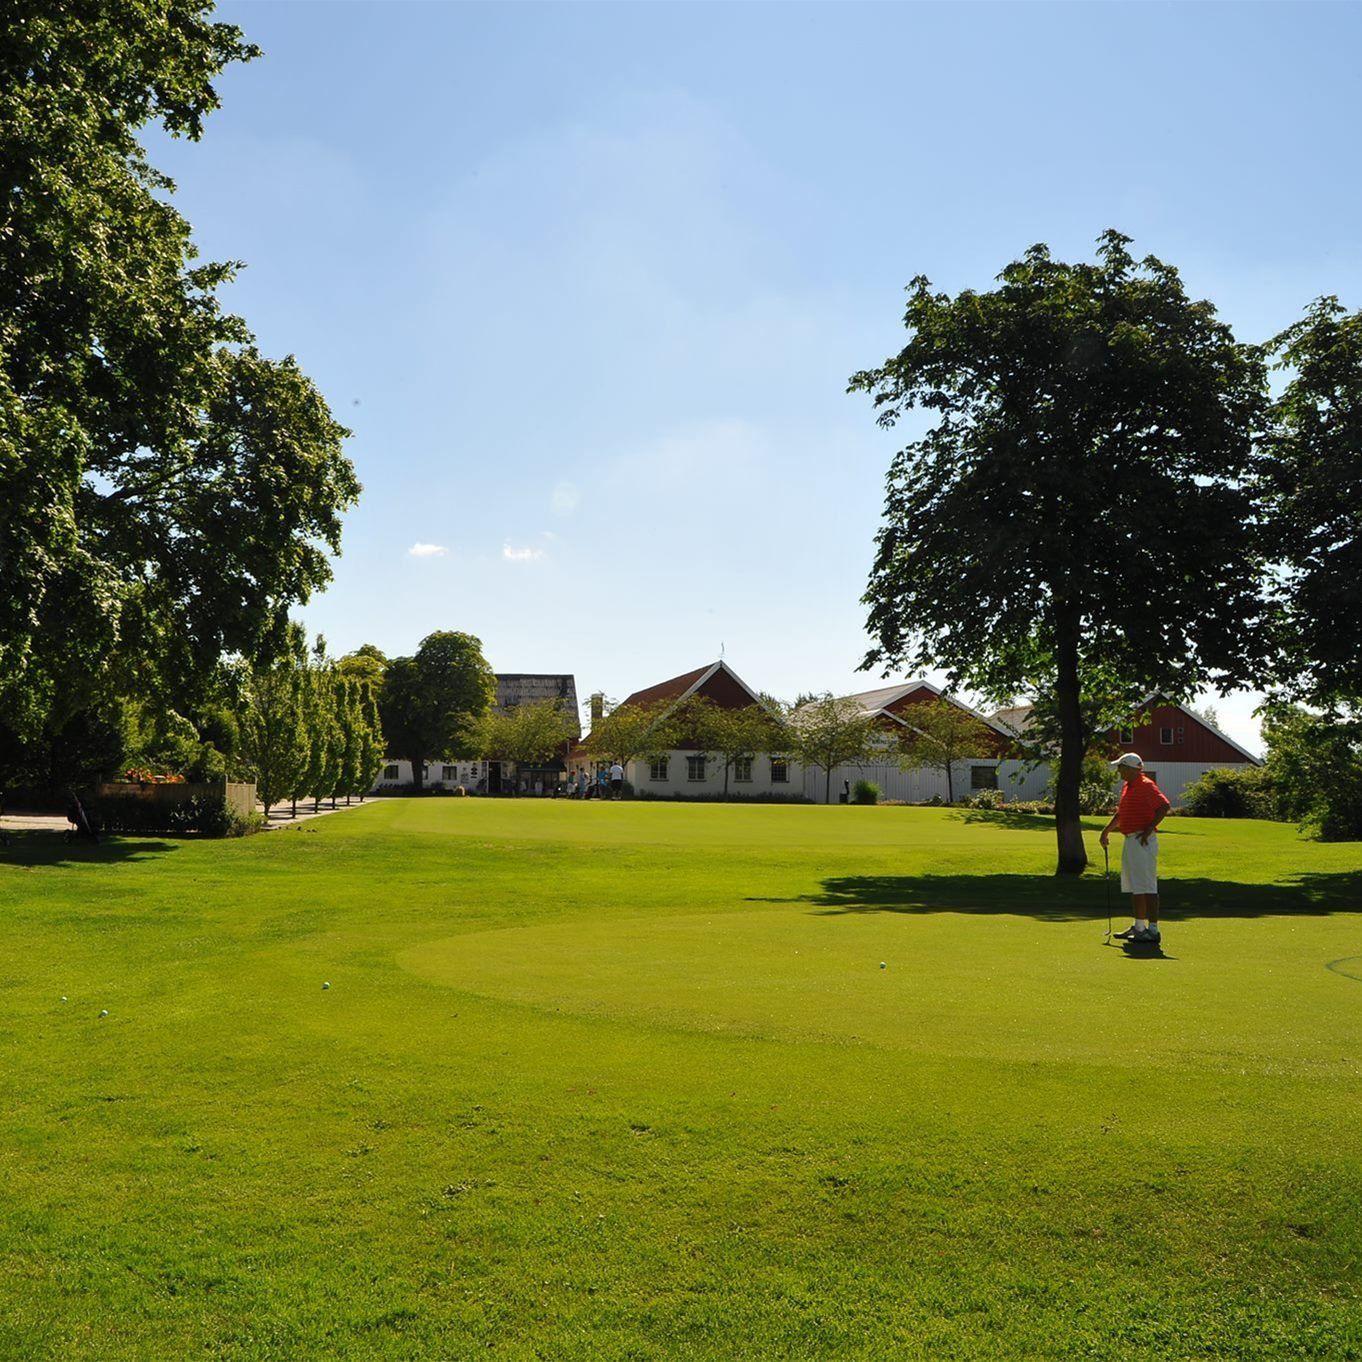 © Kävlinge Golfklubb, Kävlinge Golfklubb